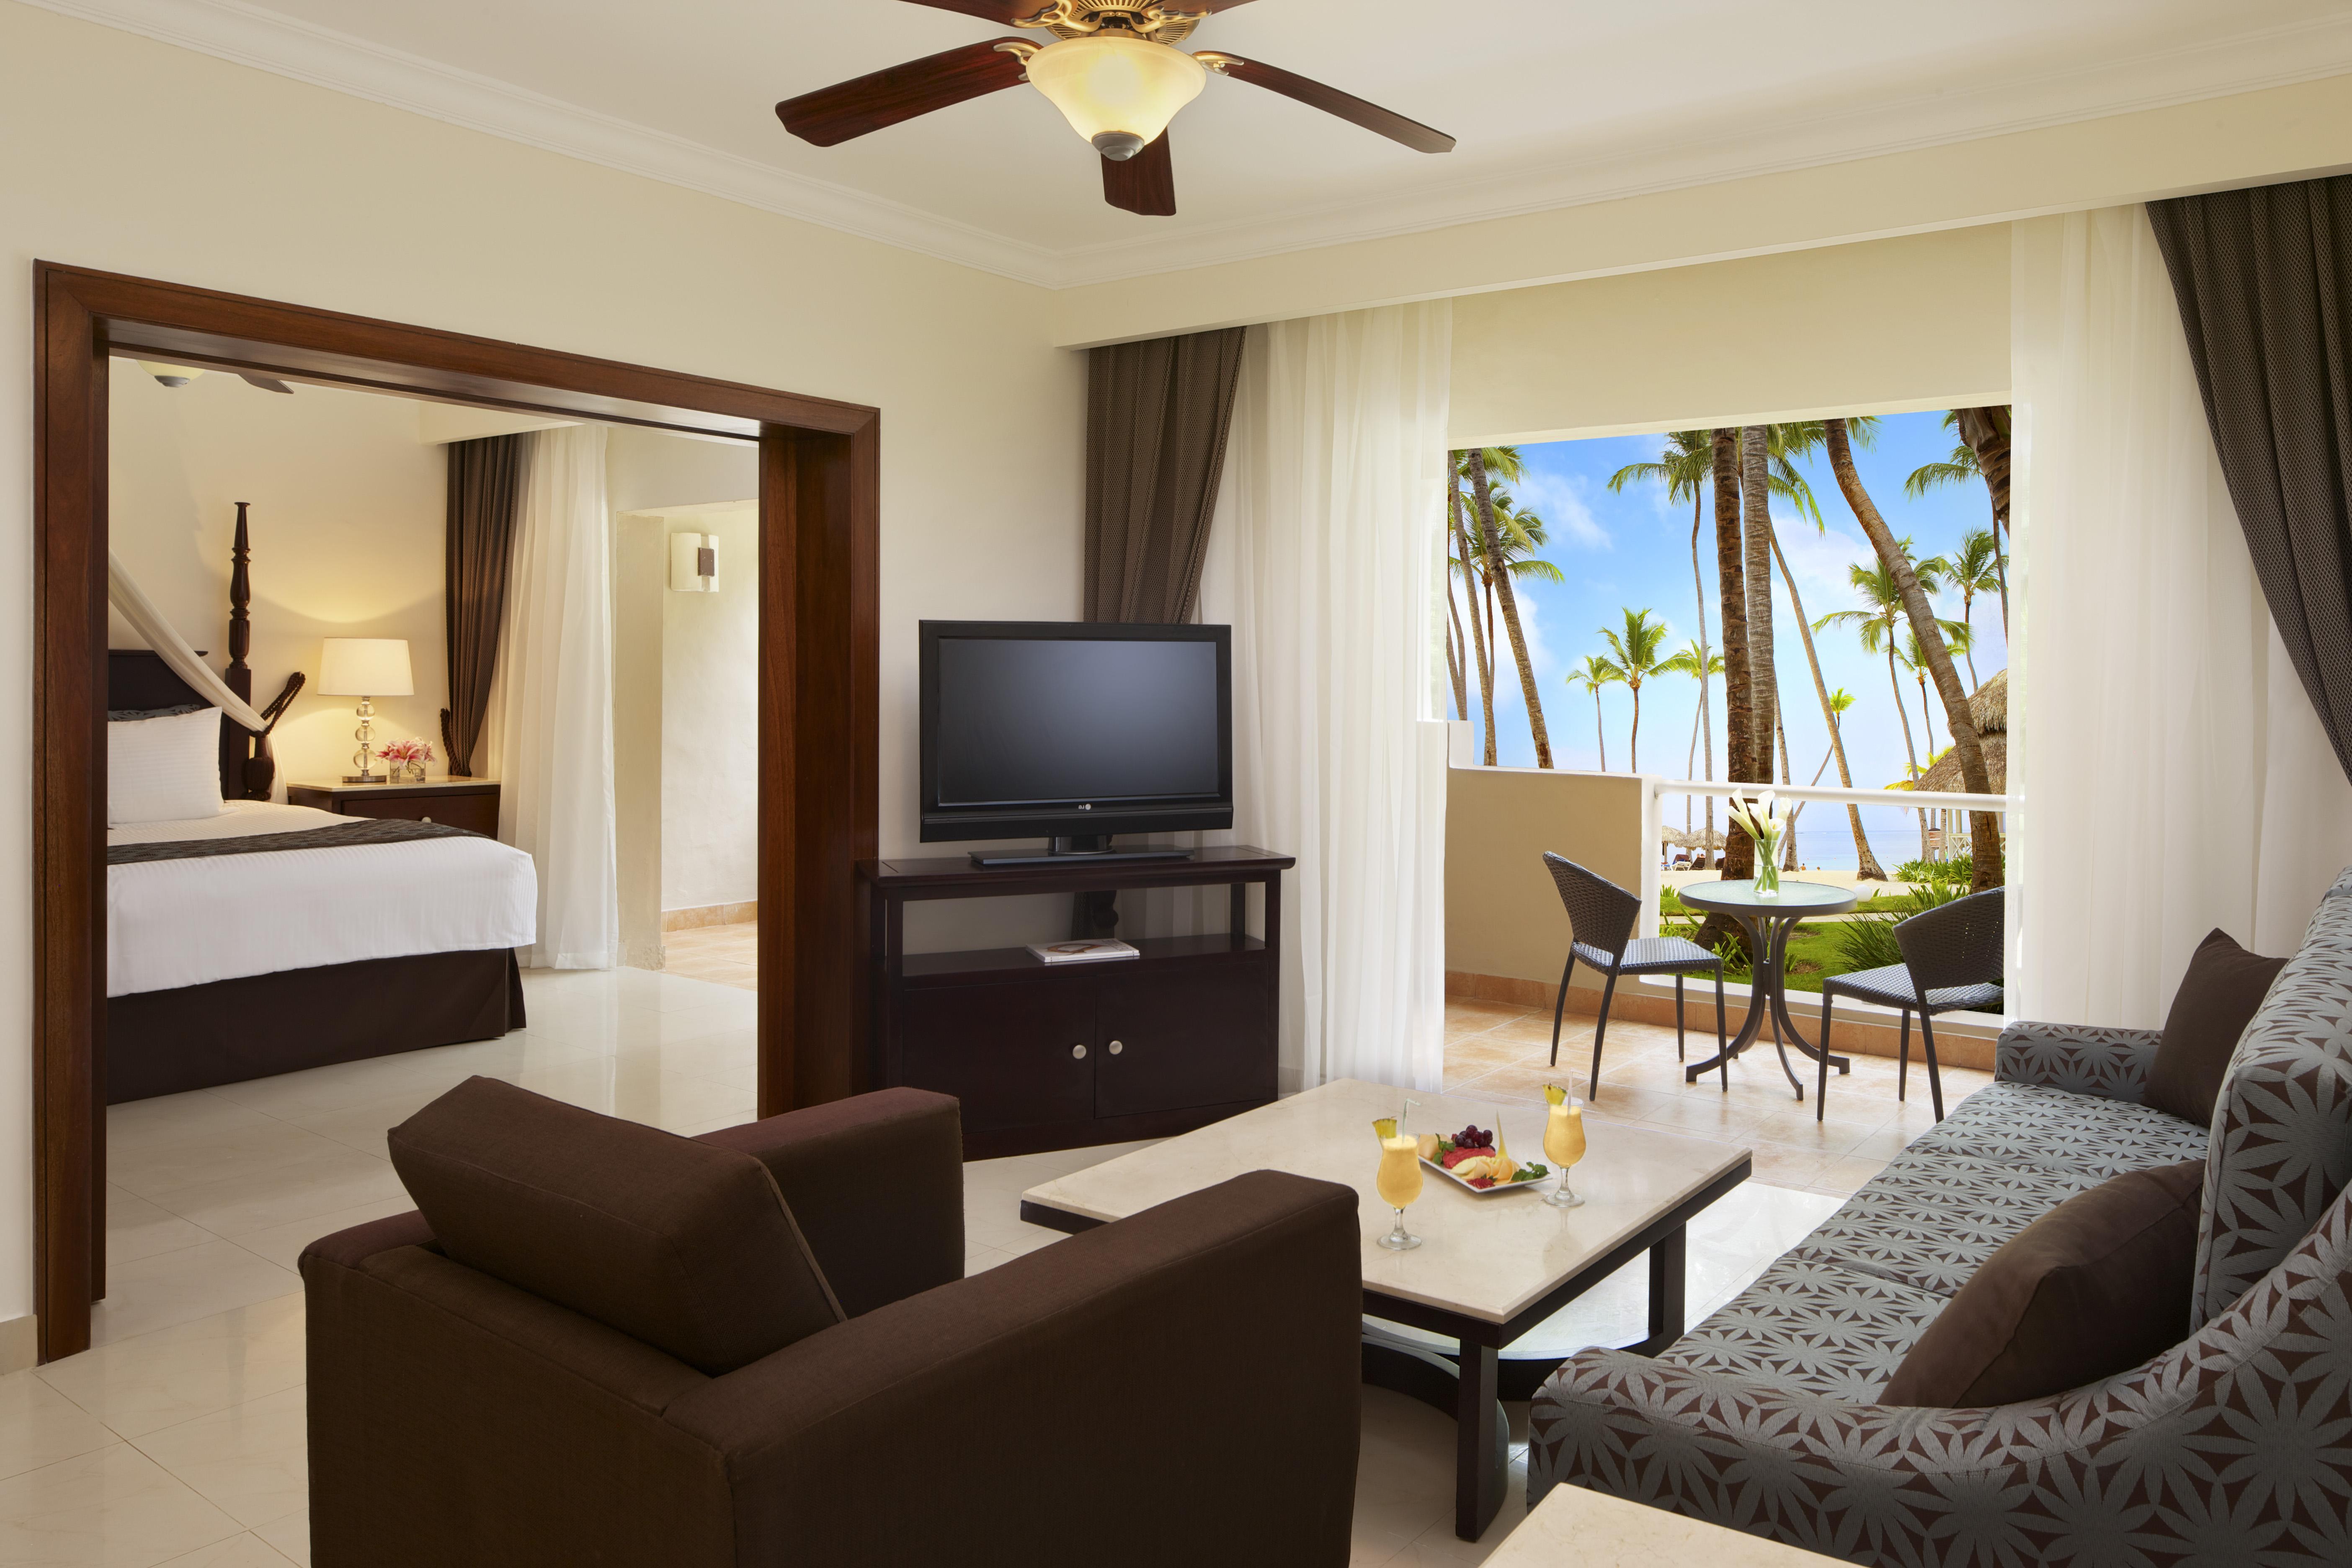 Travel Agency All-Inclusive Resort Dreams Palm Beach 32